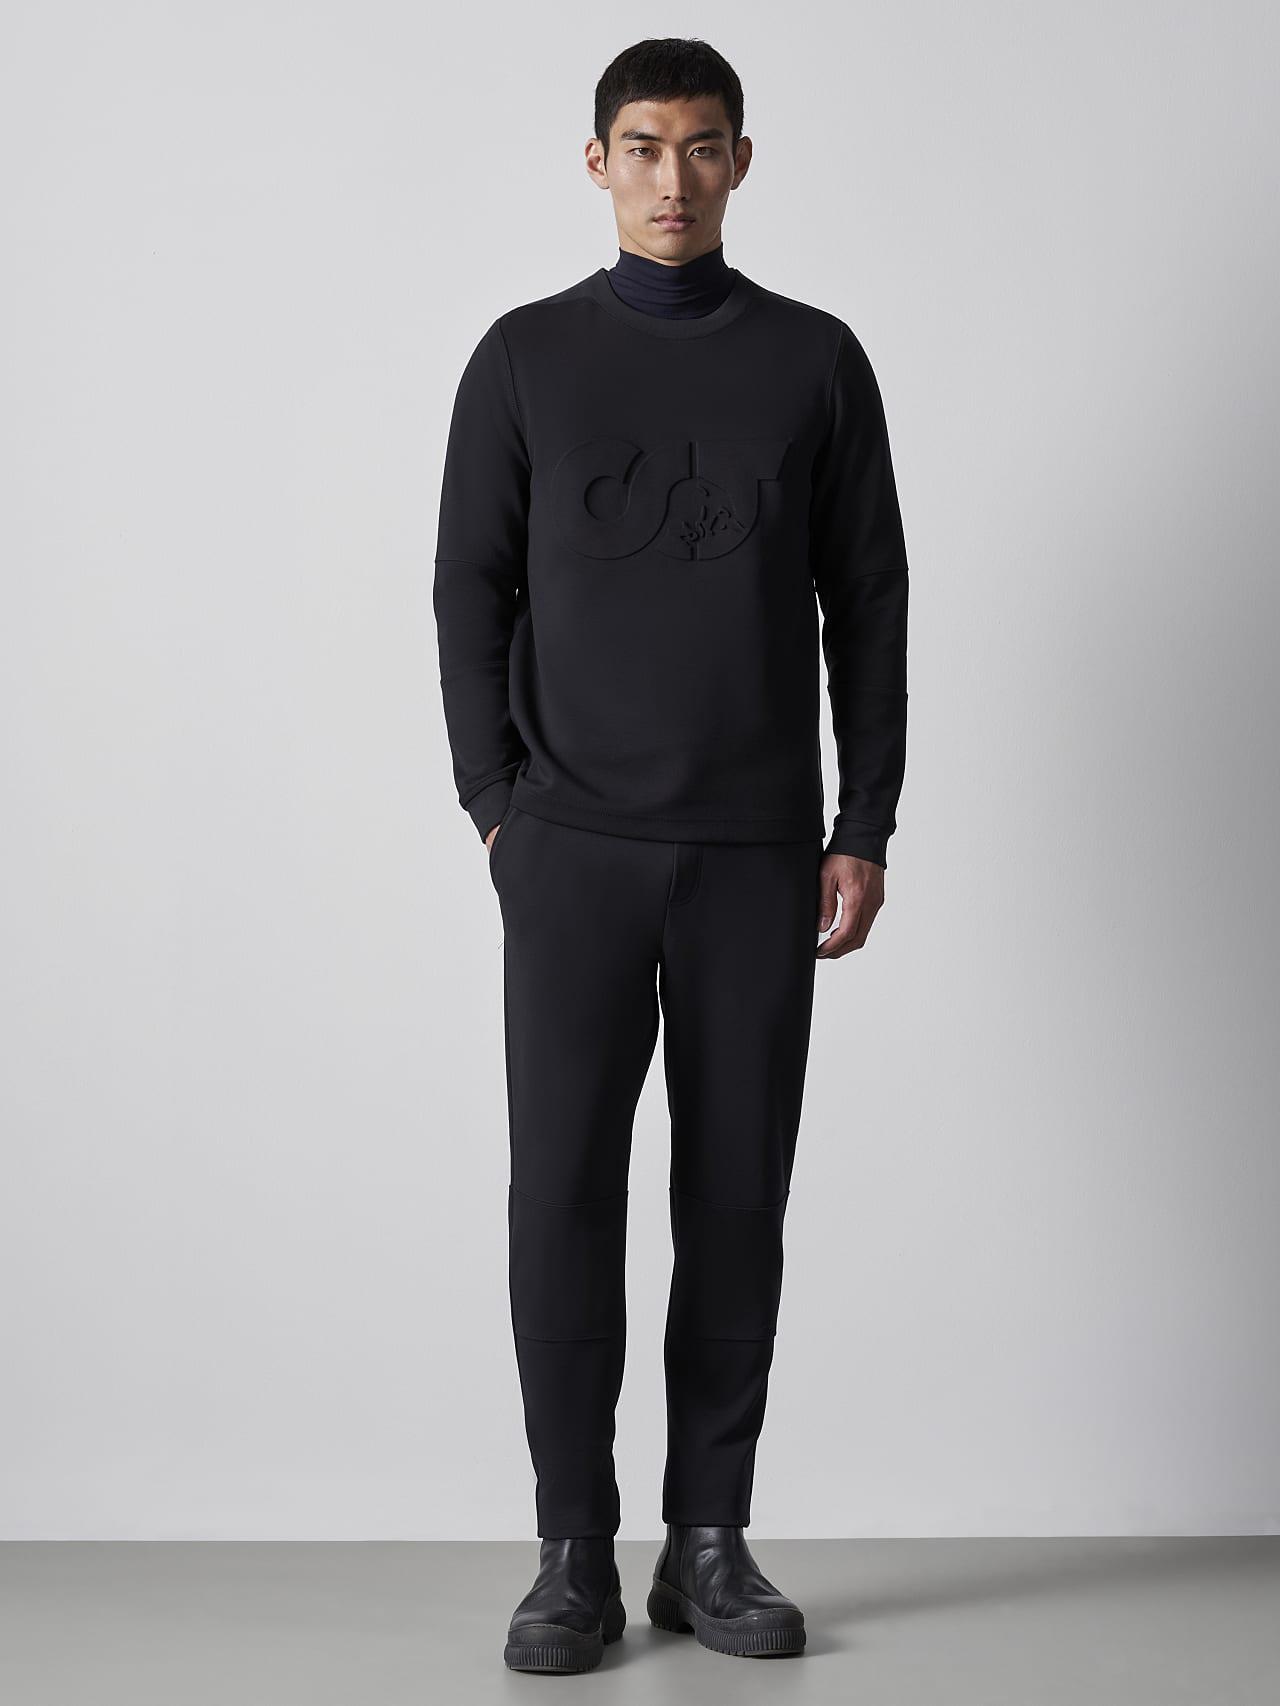 SCONA V1.Y5.02 Premium Sweatshirt black Front Alpha Tauri